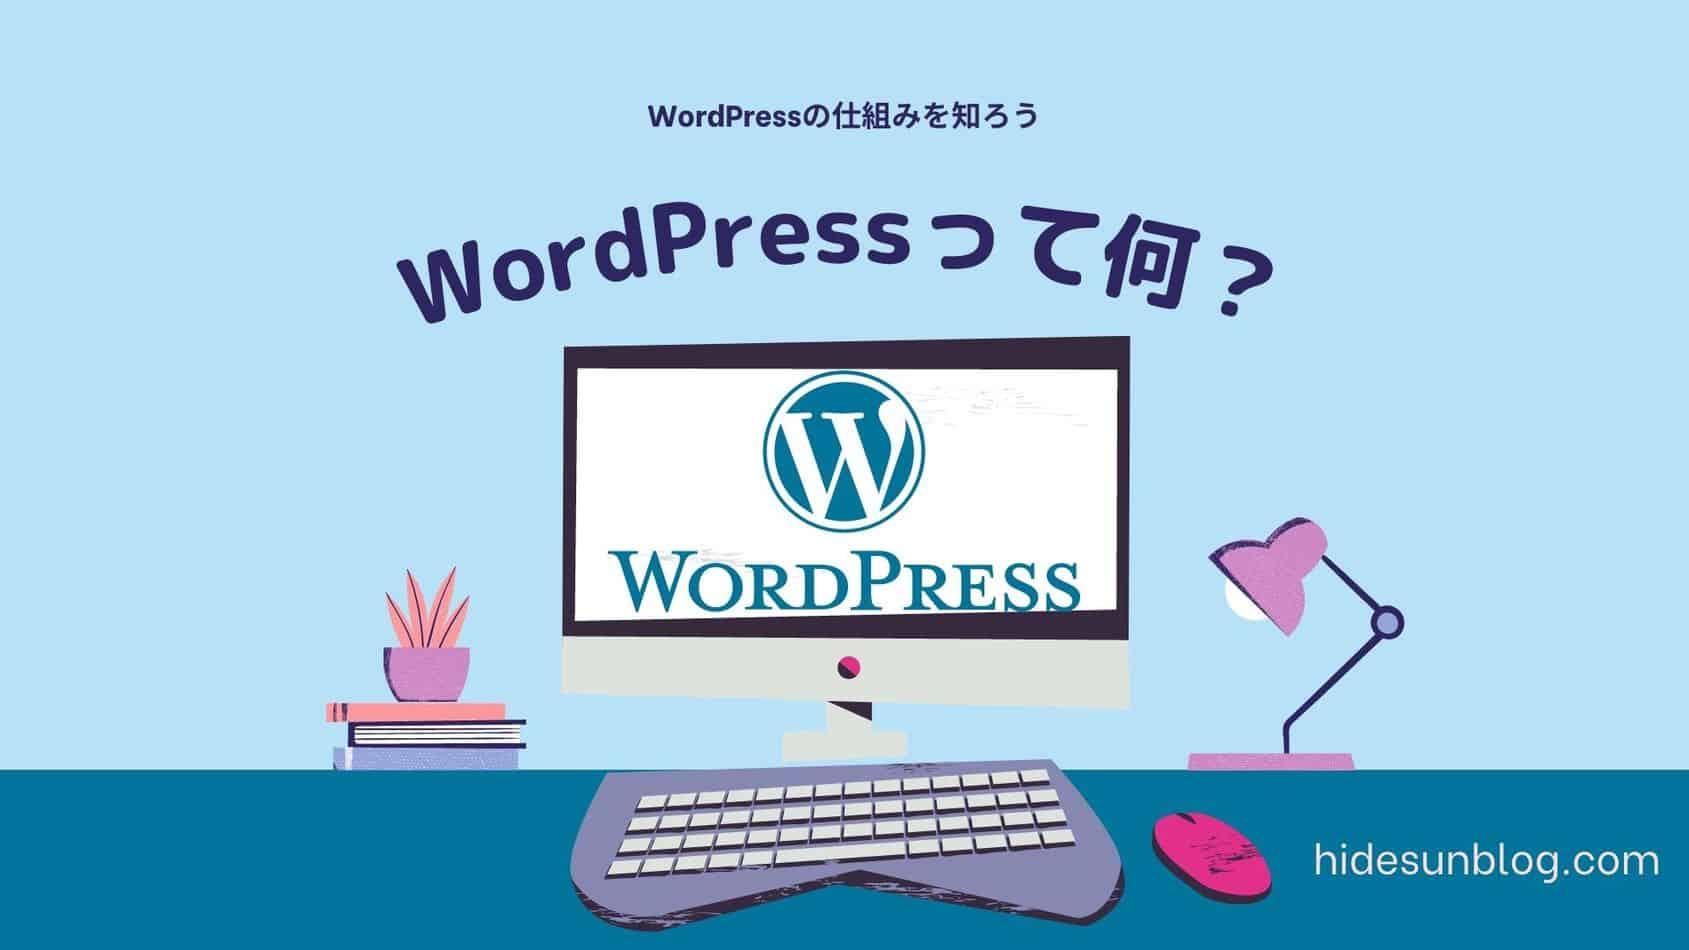 WordPressでブログを始める仕組みを解説